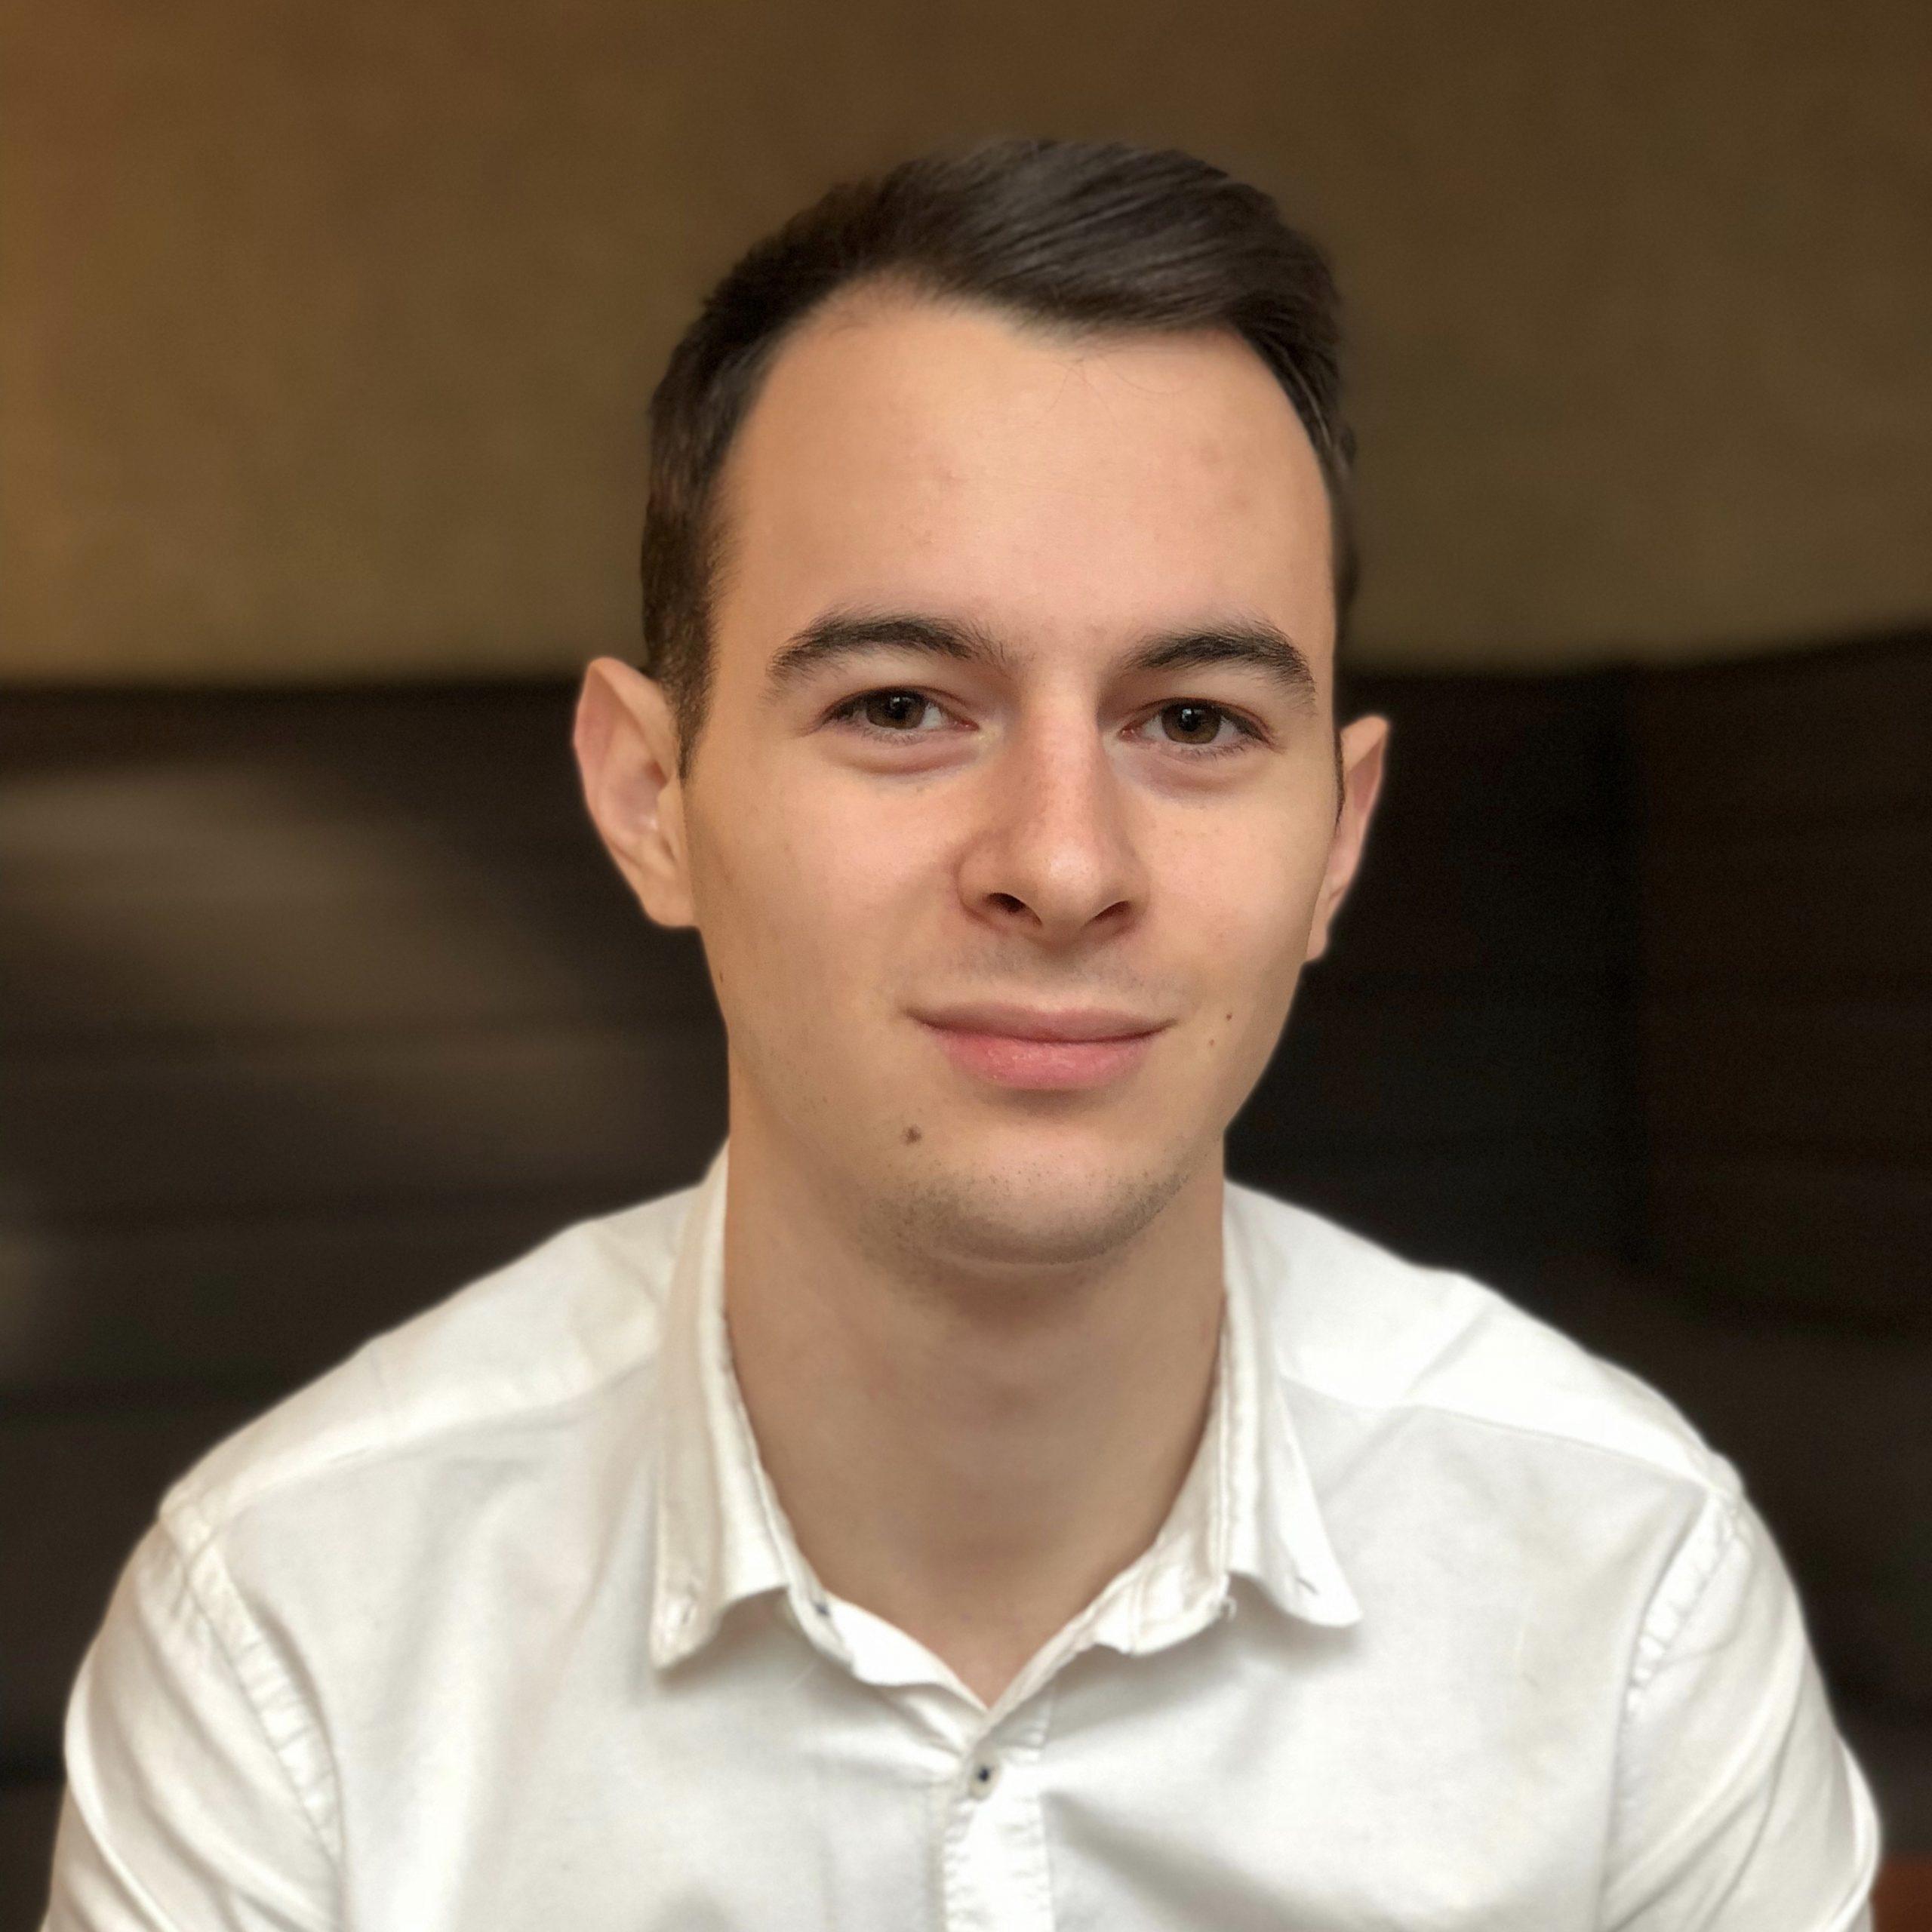 Gabor Galantai - COO and Founder at CoinCash